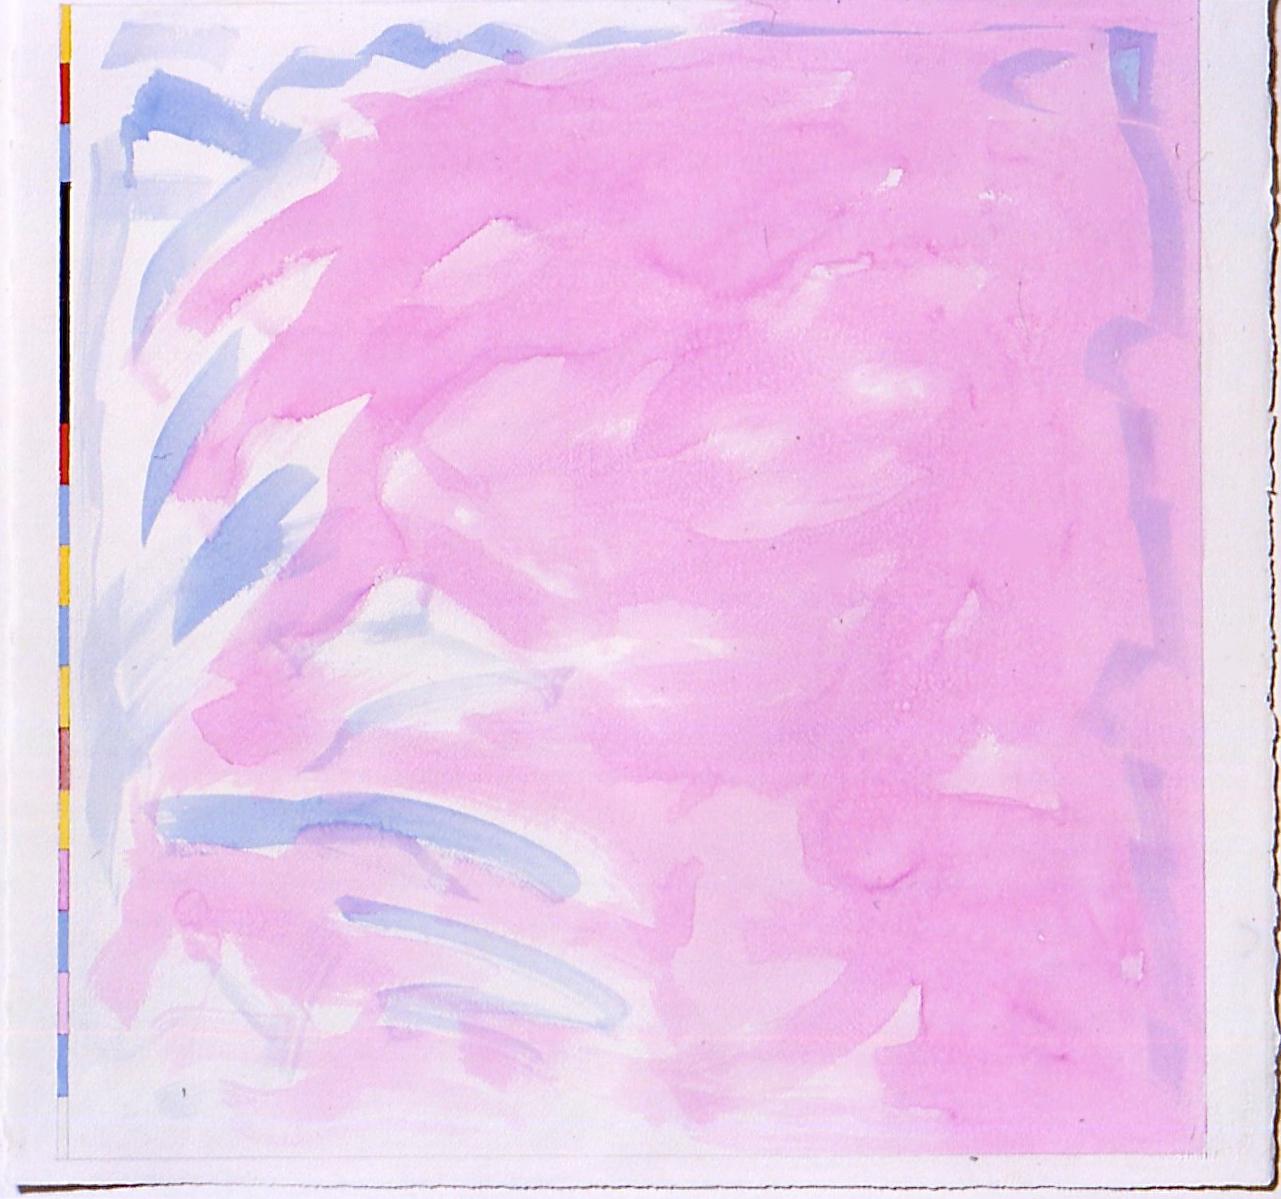 "Lagoon (PG38), 2004, gouache on paper, 20 1/4""x20 1/4"" (image), 20 7/8""x22 3/8""(paper)"